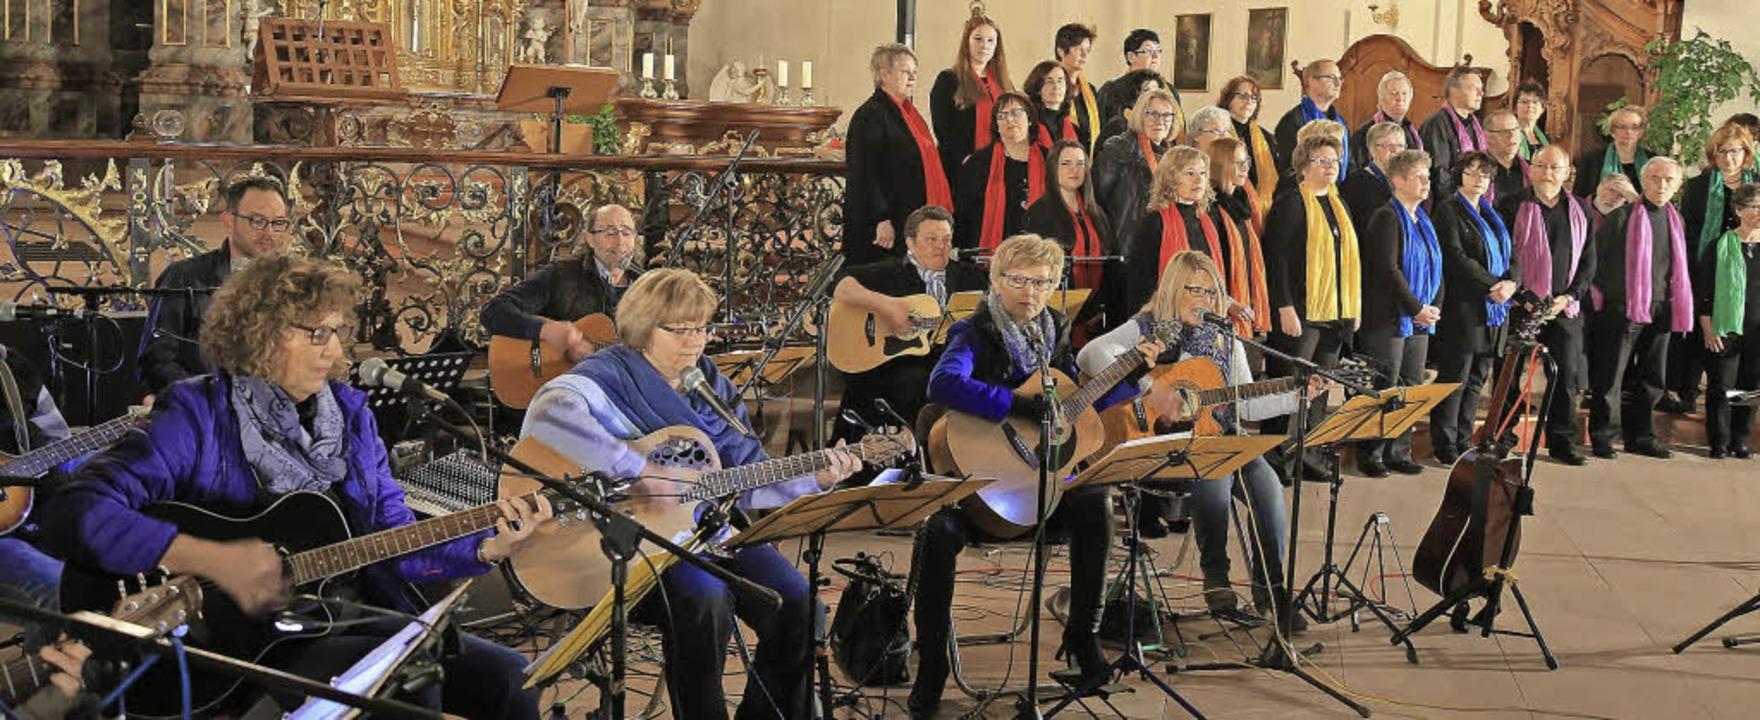 Premiere: Die Gitarrengruppe Saitenwin...-Singers beim Konzert in St. Landelin   | Foto: Decoux-KOne